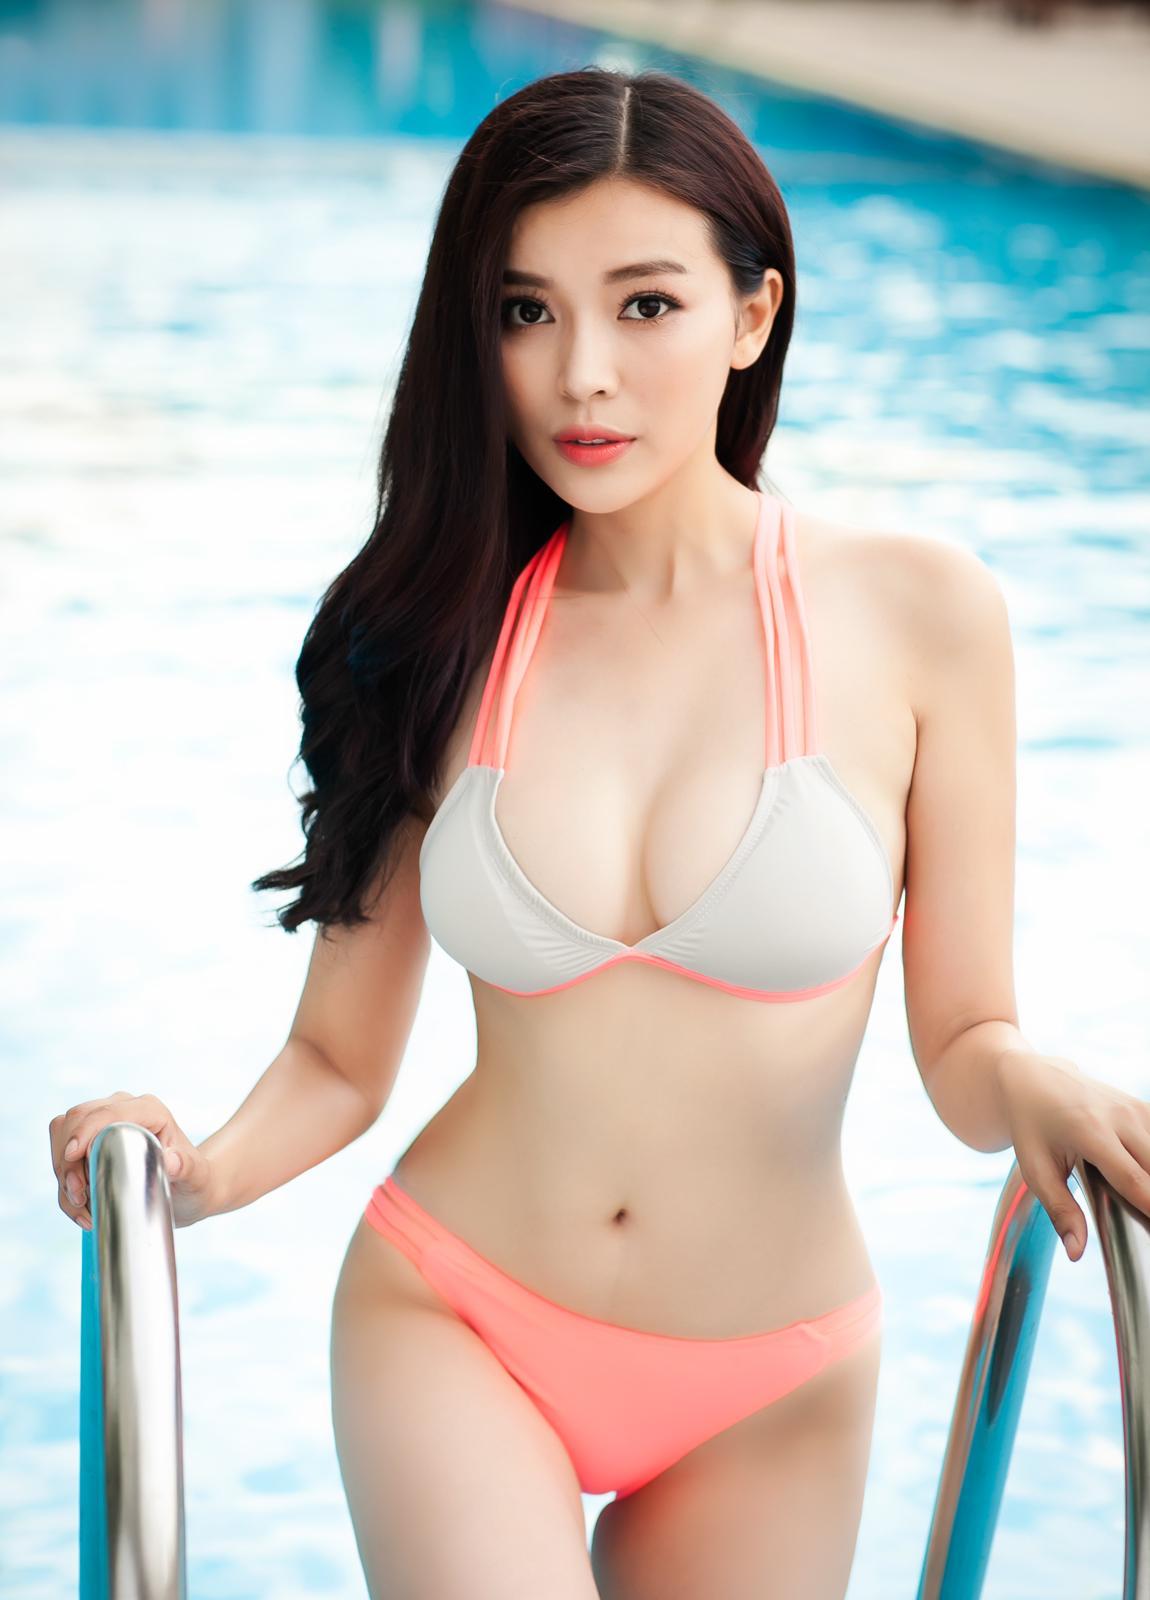 Cebu sexy girl gallery